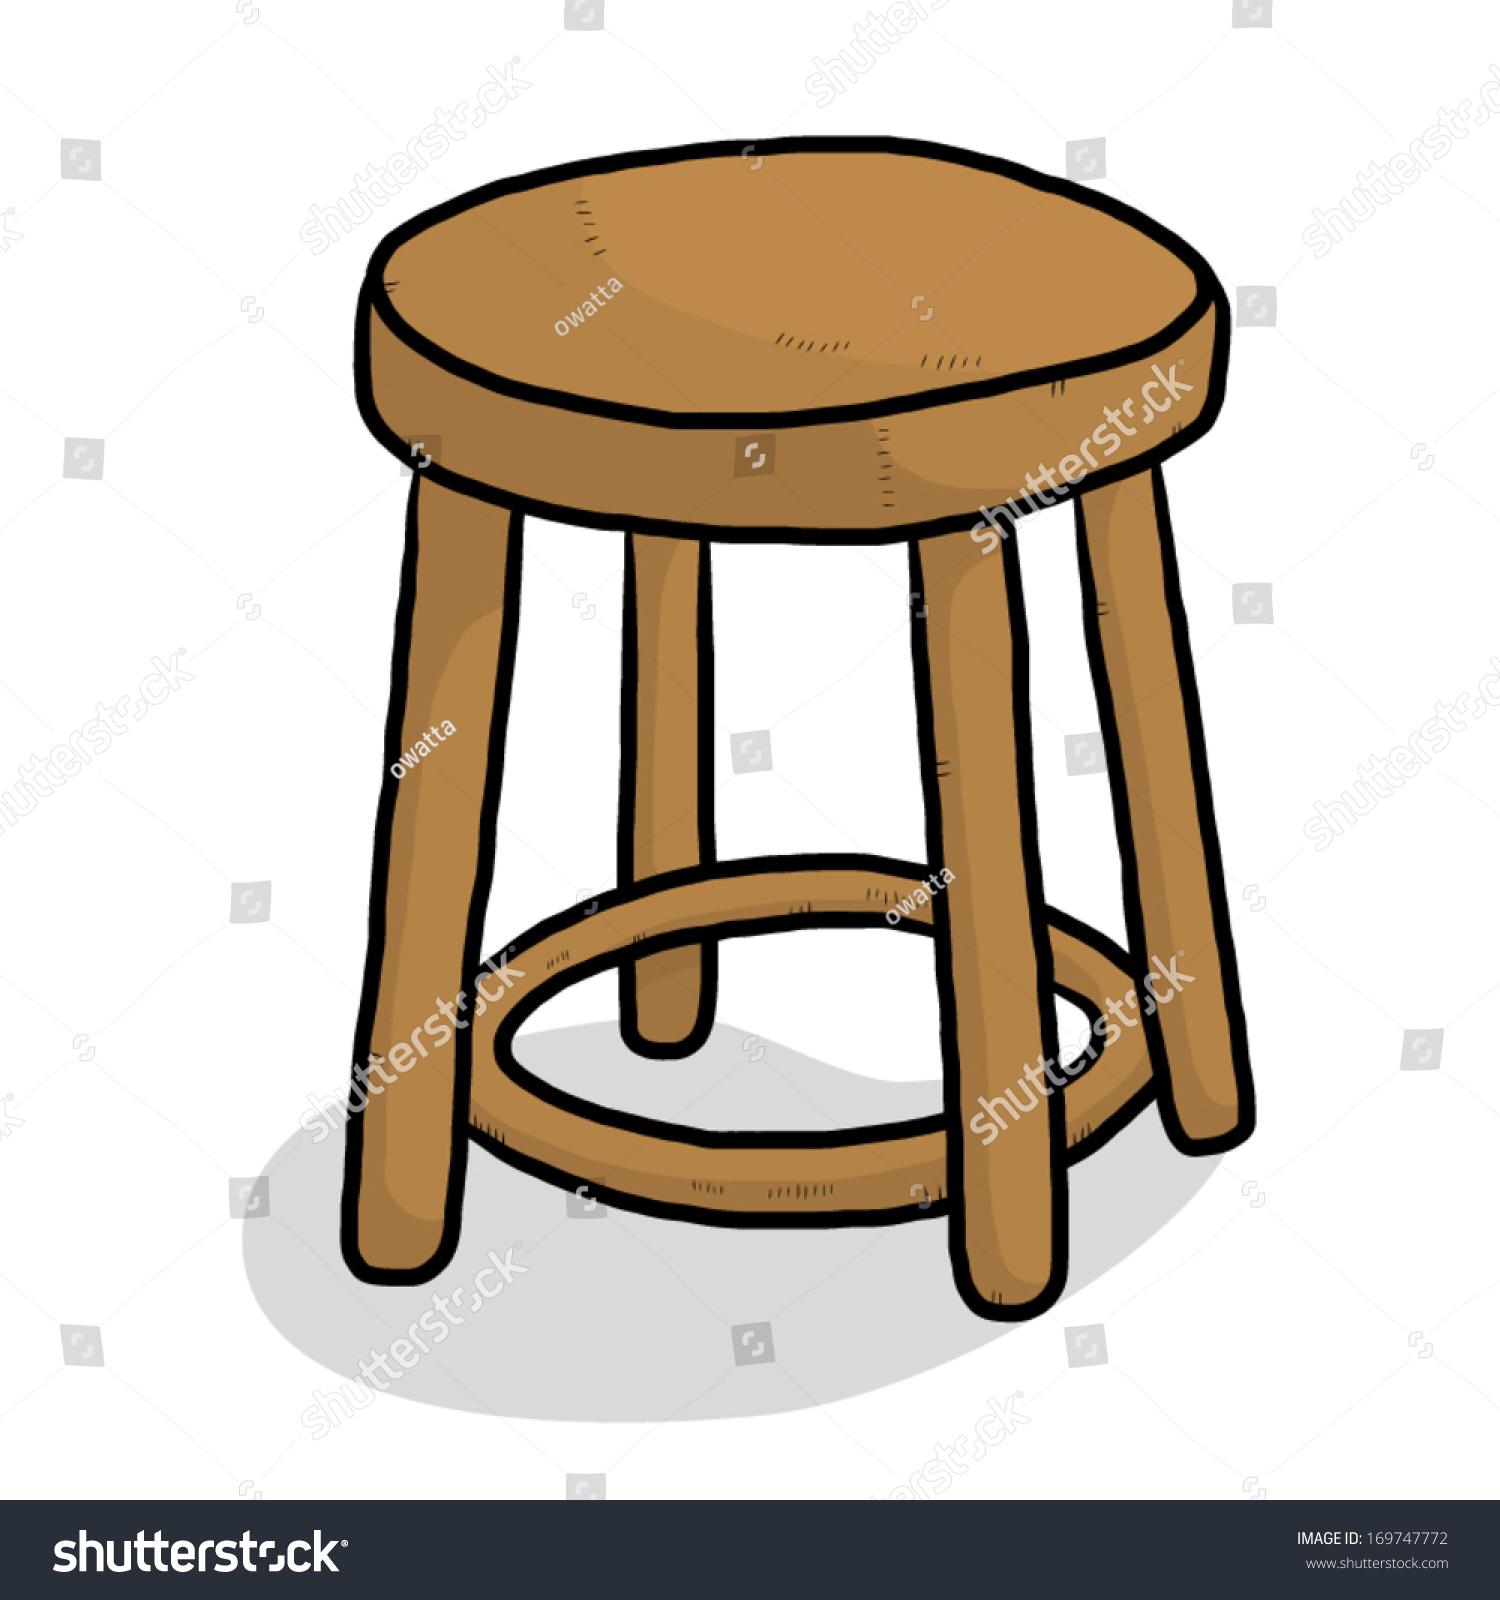 Wooden chair cartoon vector illustration isolated stock